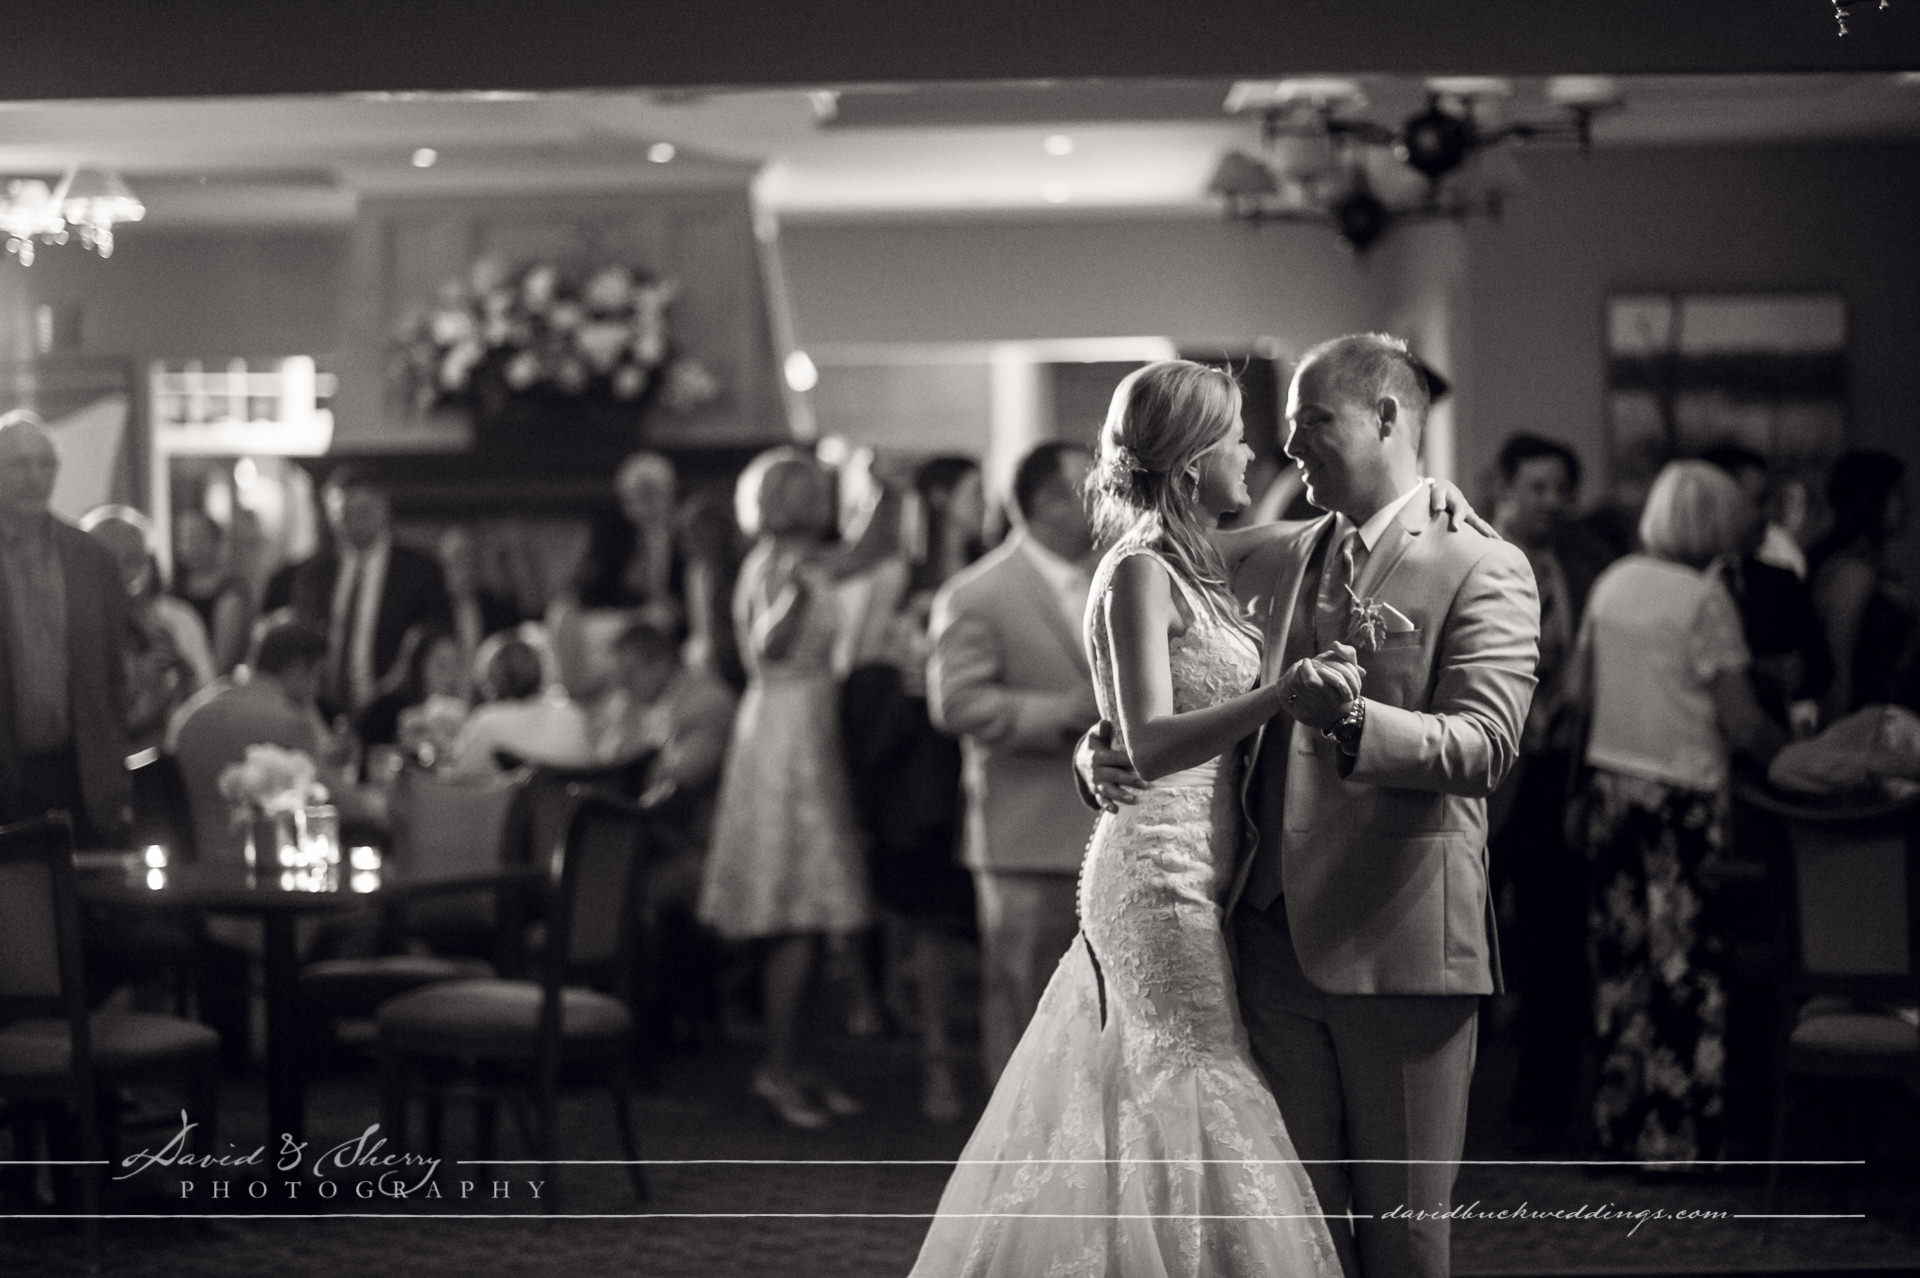 Cobble_Beach_Wedding_Photography_Owen_Sound_41